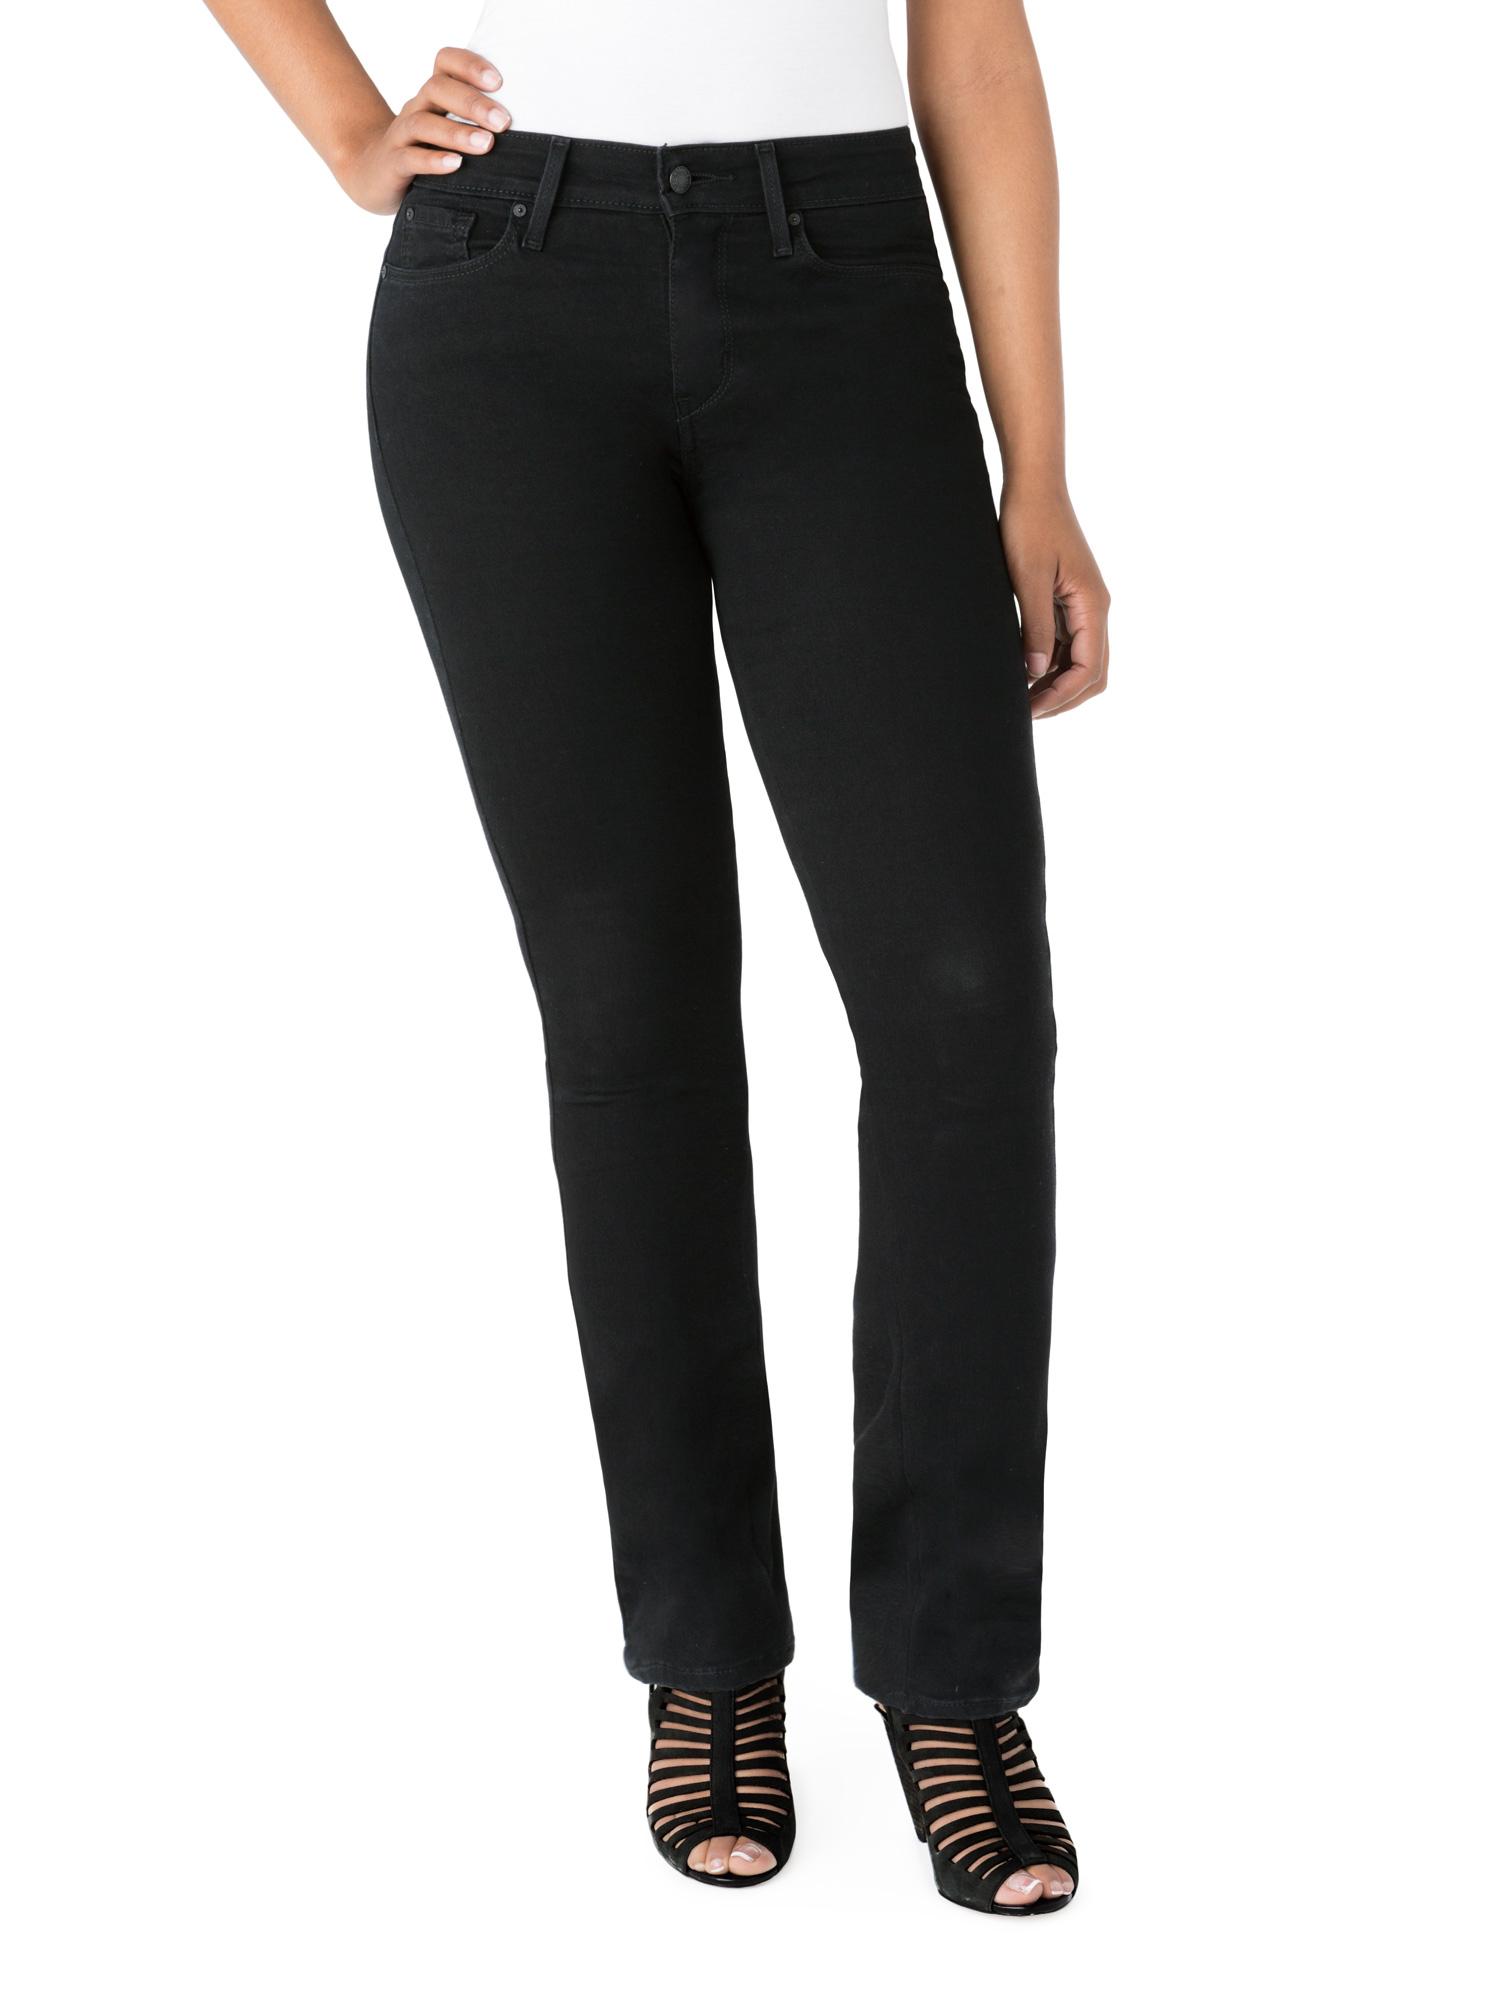 Women's Curvy Straight Jean